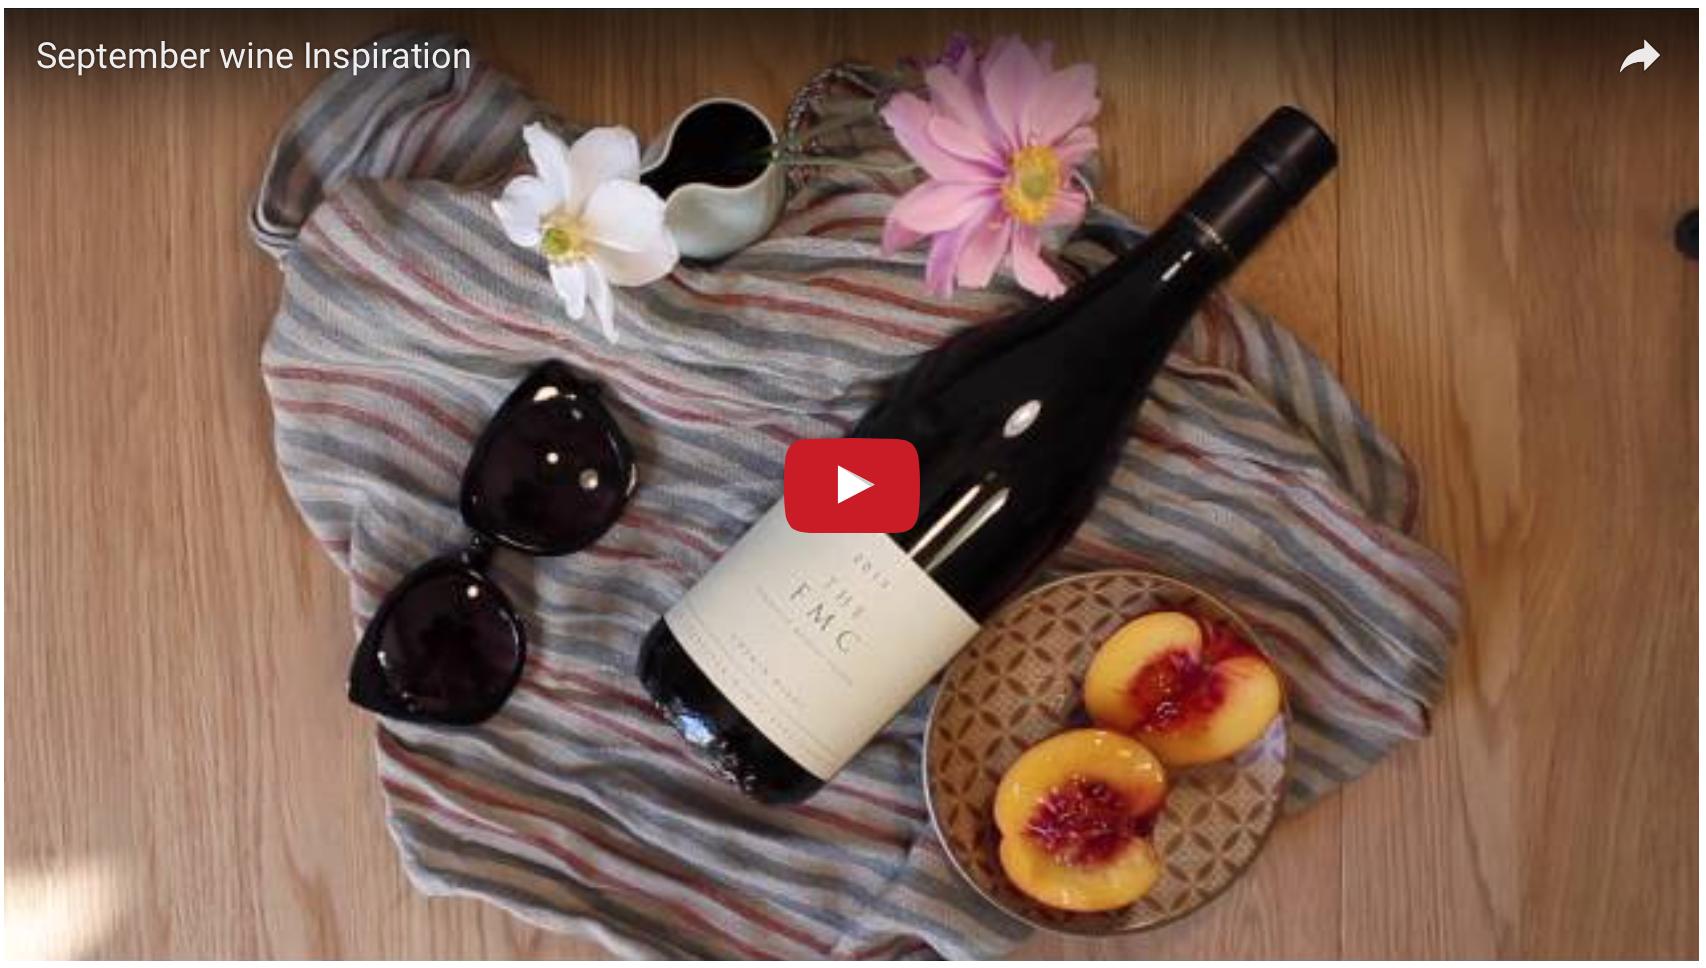 September wine inspiration video